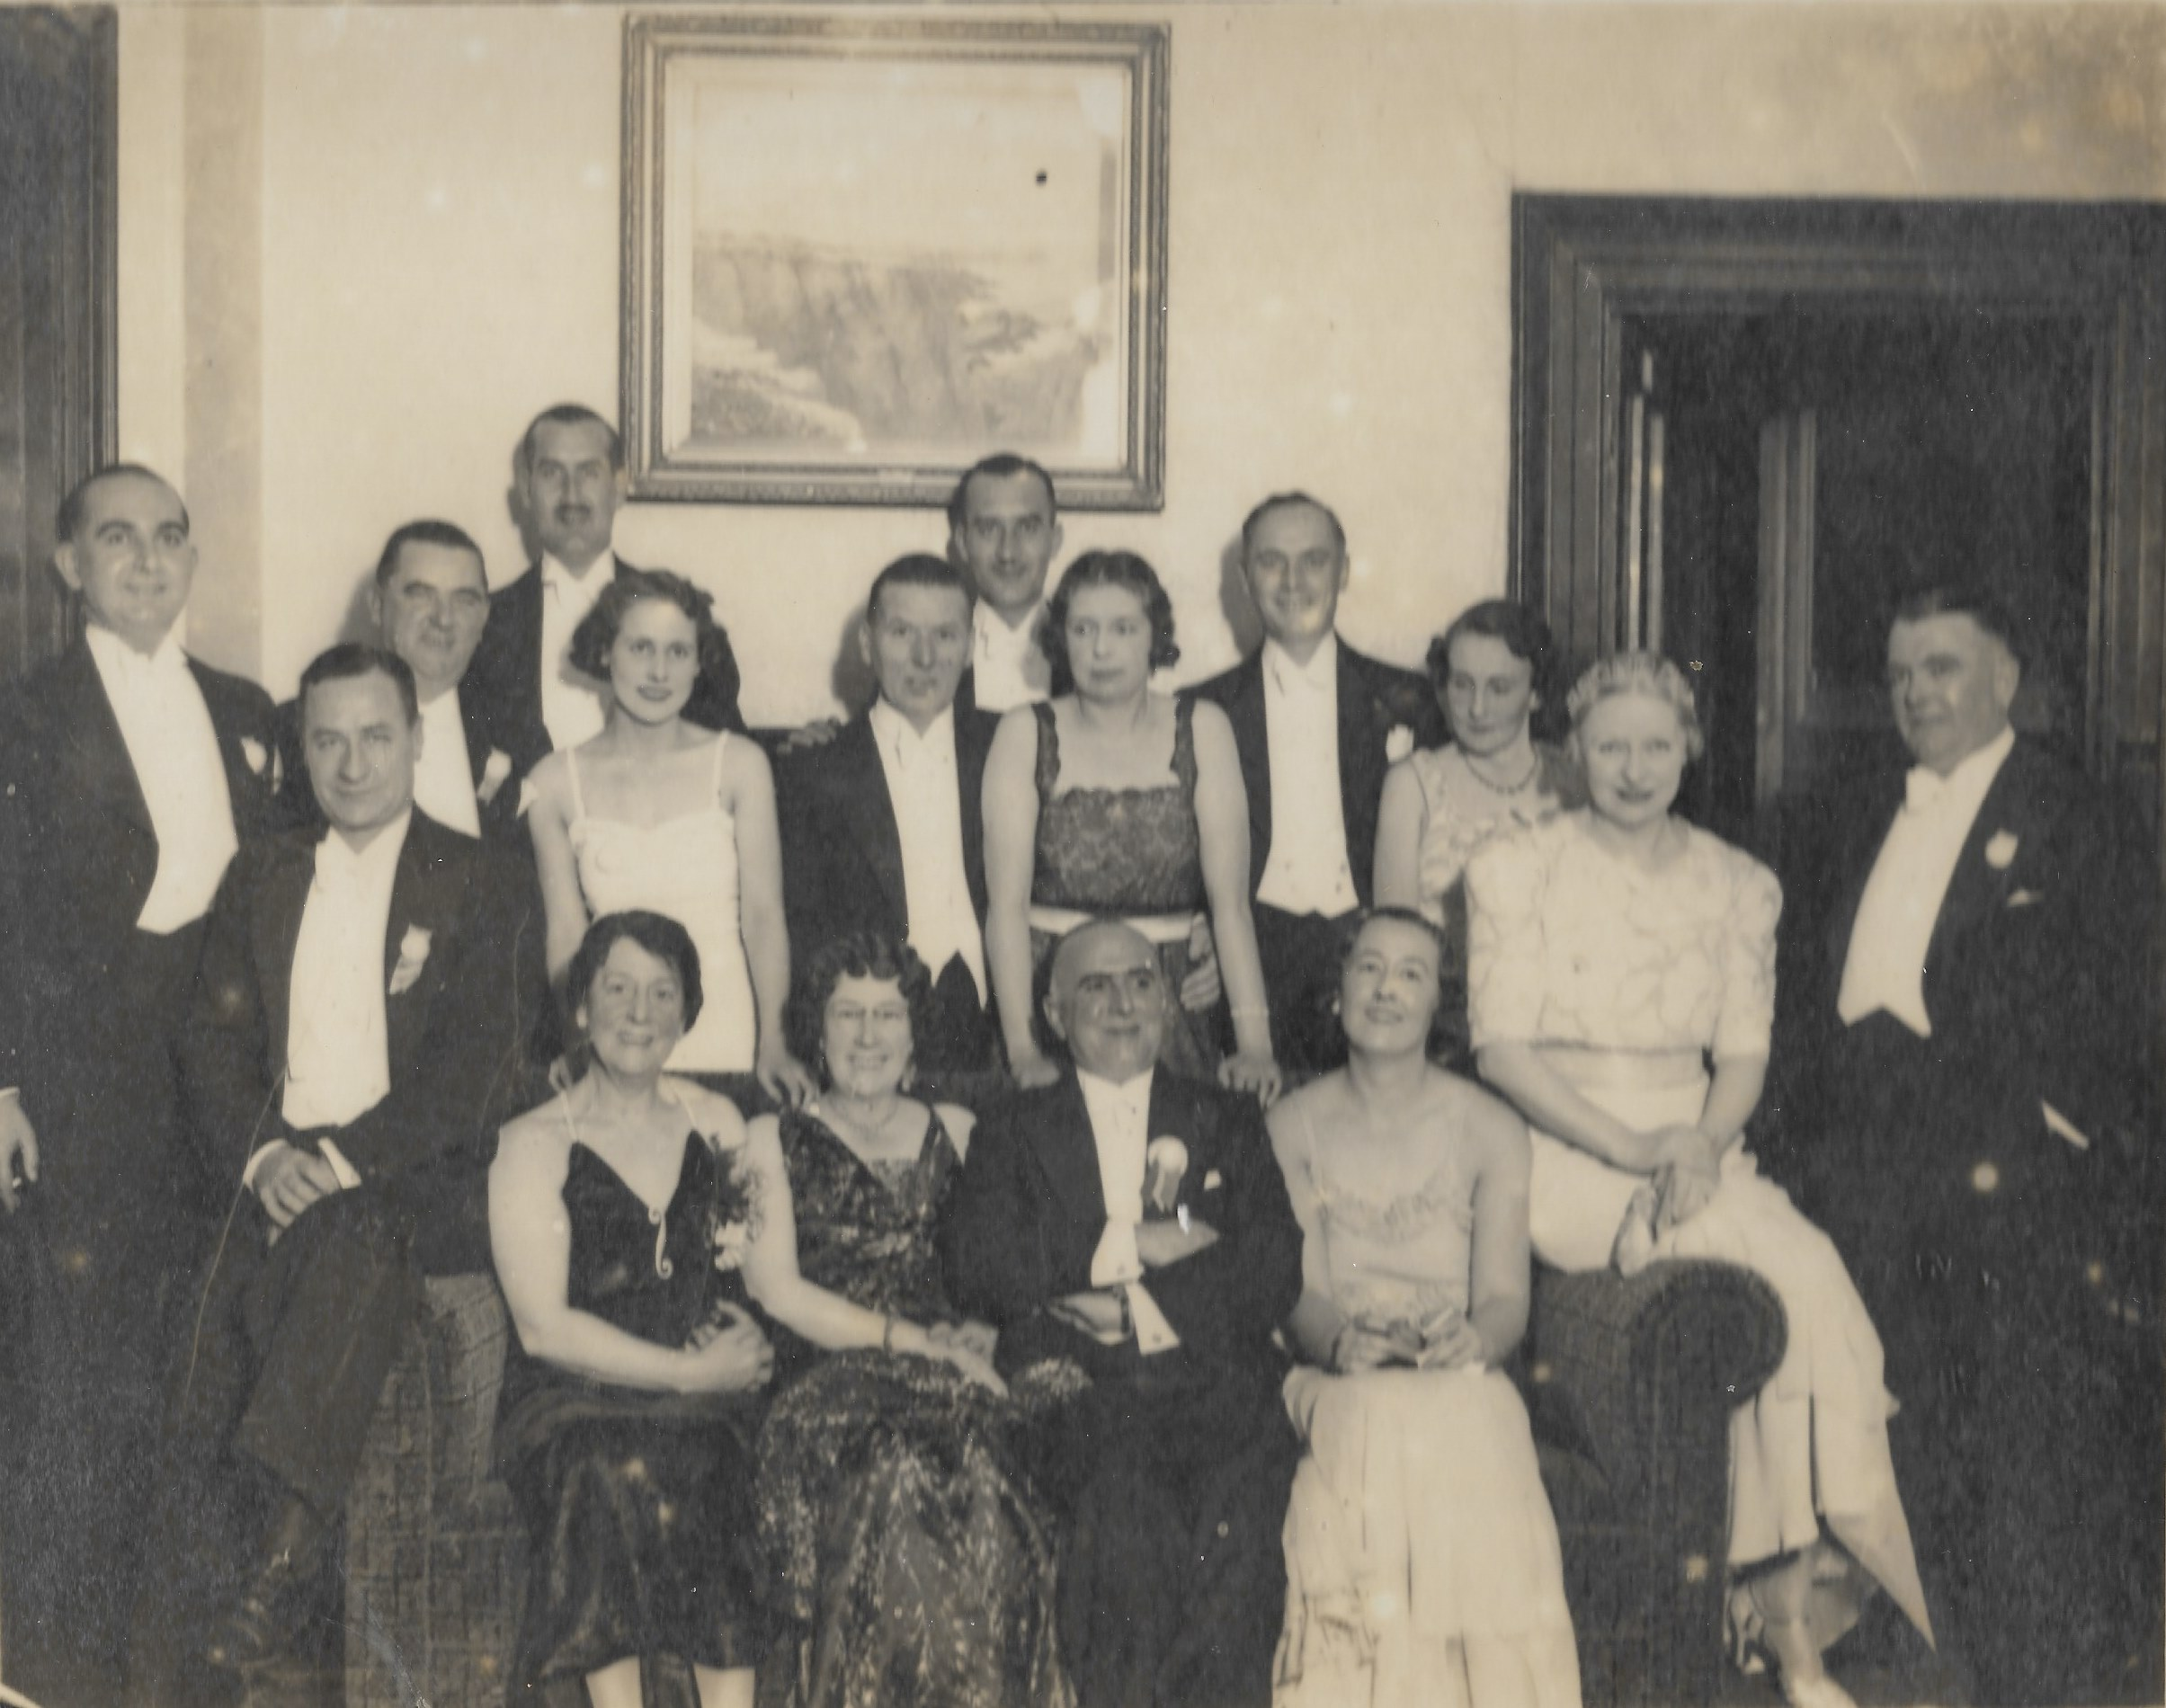 1936 Annual Dinner Dance